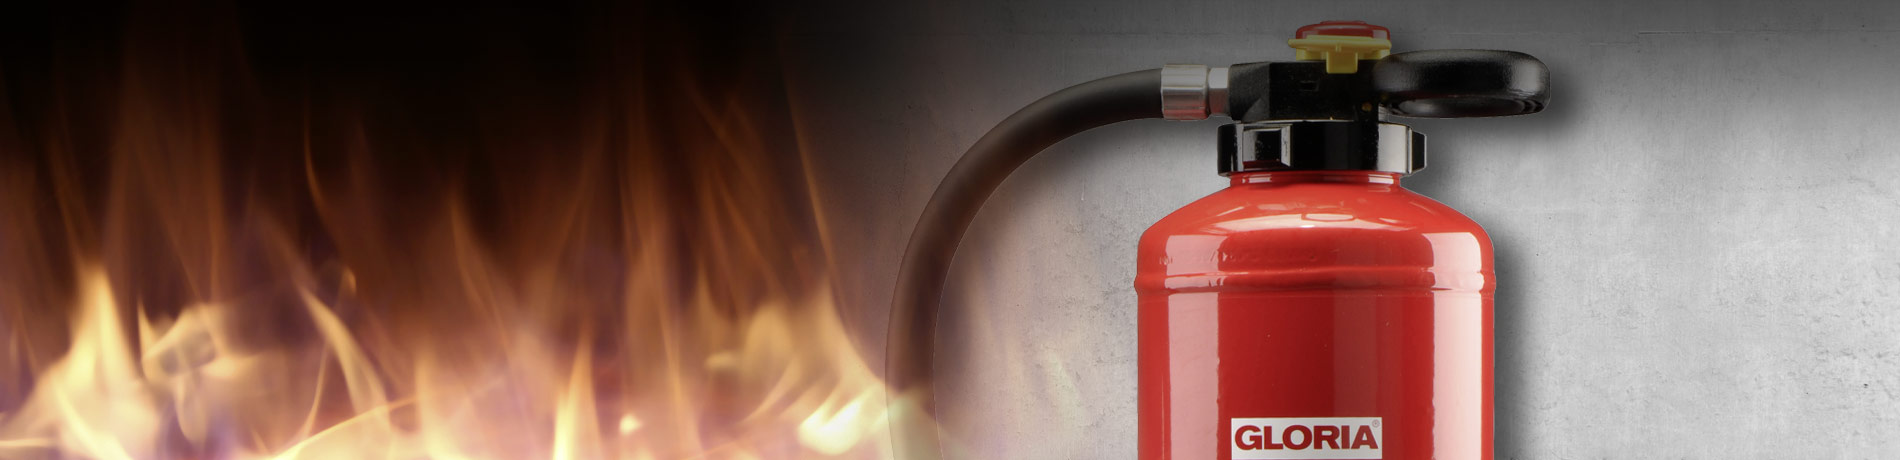 Fettbrand Feuerlöscher